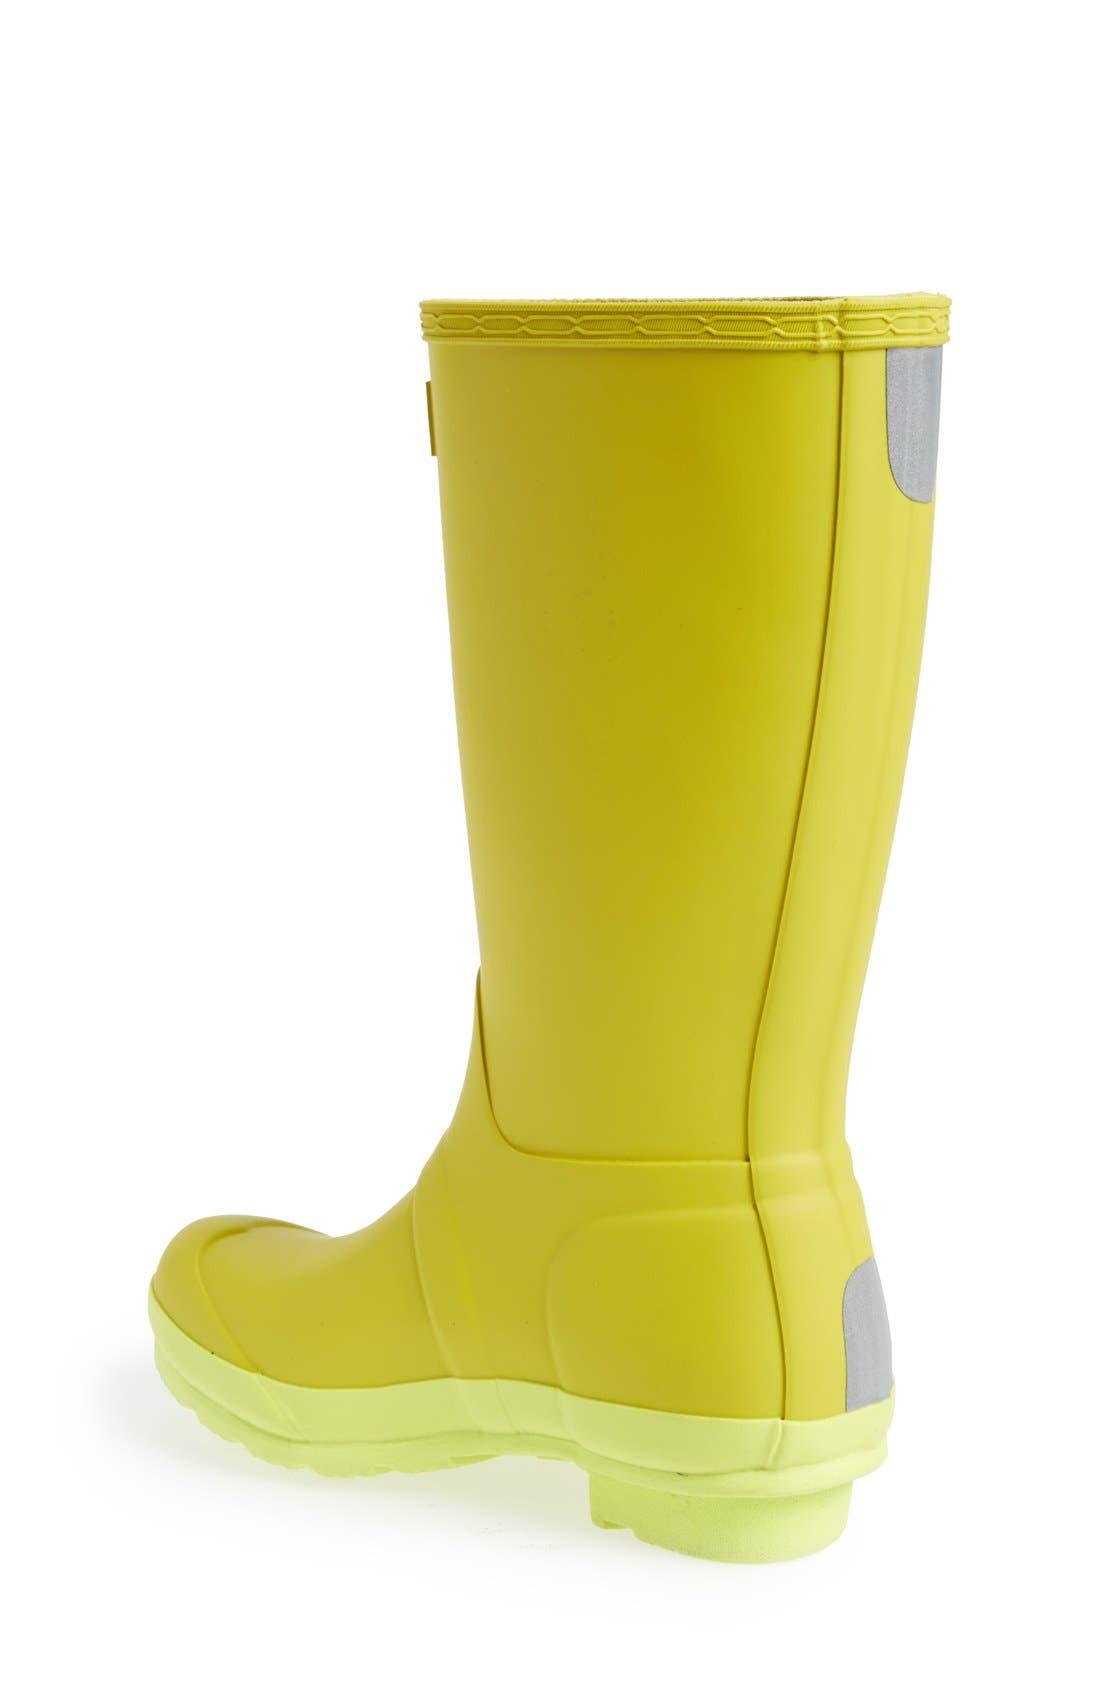 Alternate Image 2  - Hunter 'Original Contrast Sole' Waterproof Rain Boot (Little Kid & Big Kid)